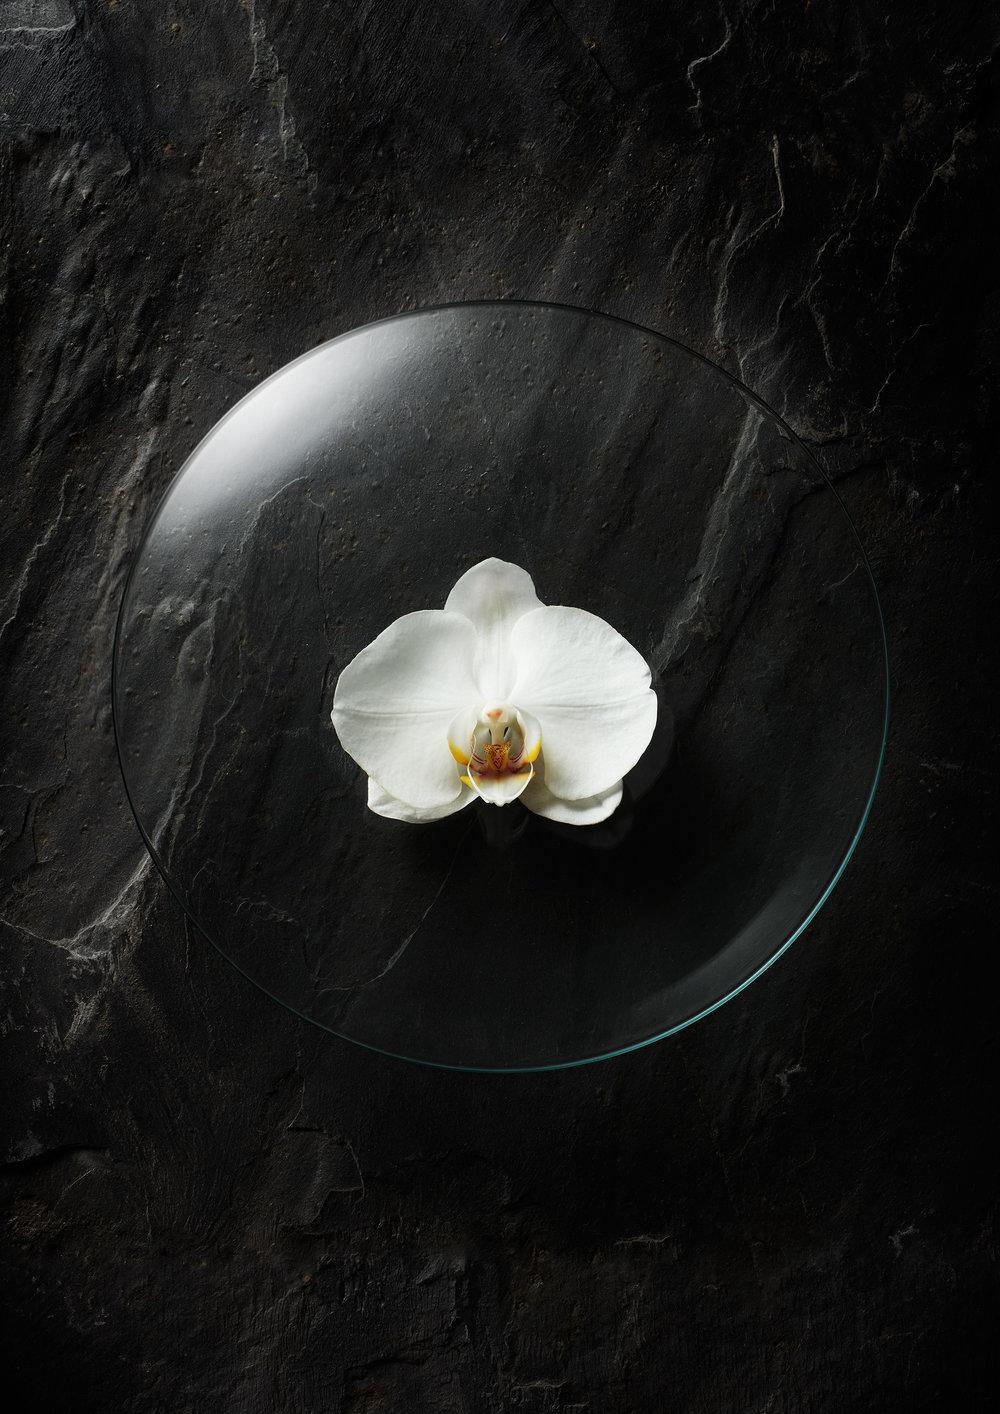 WatchGlassFlowers-Orchid.jpg